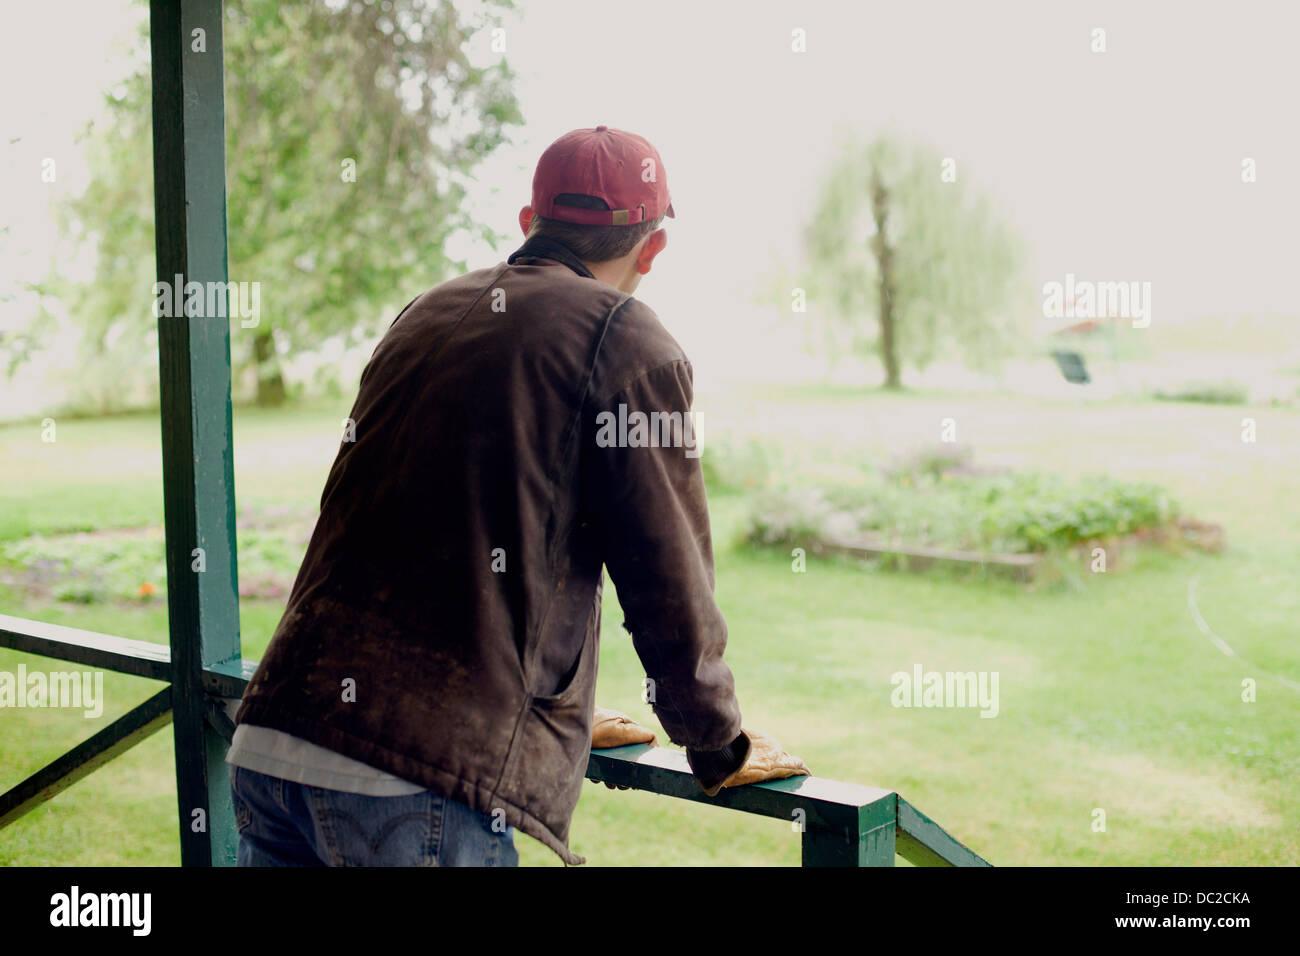 Man standing on verandah looking at garden - Stock Image